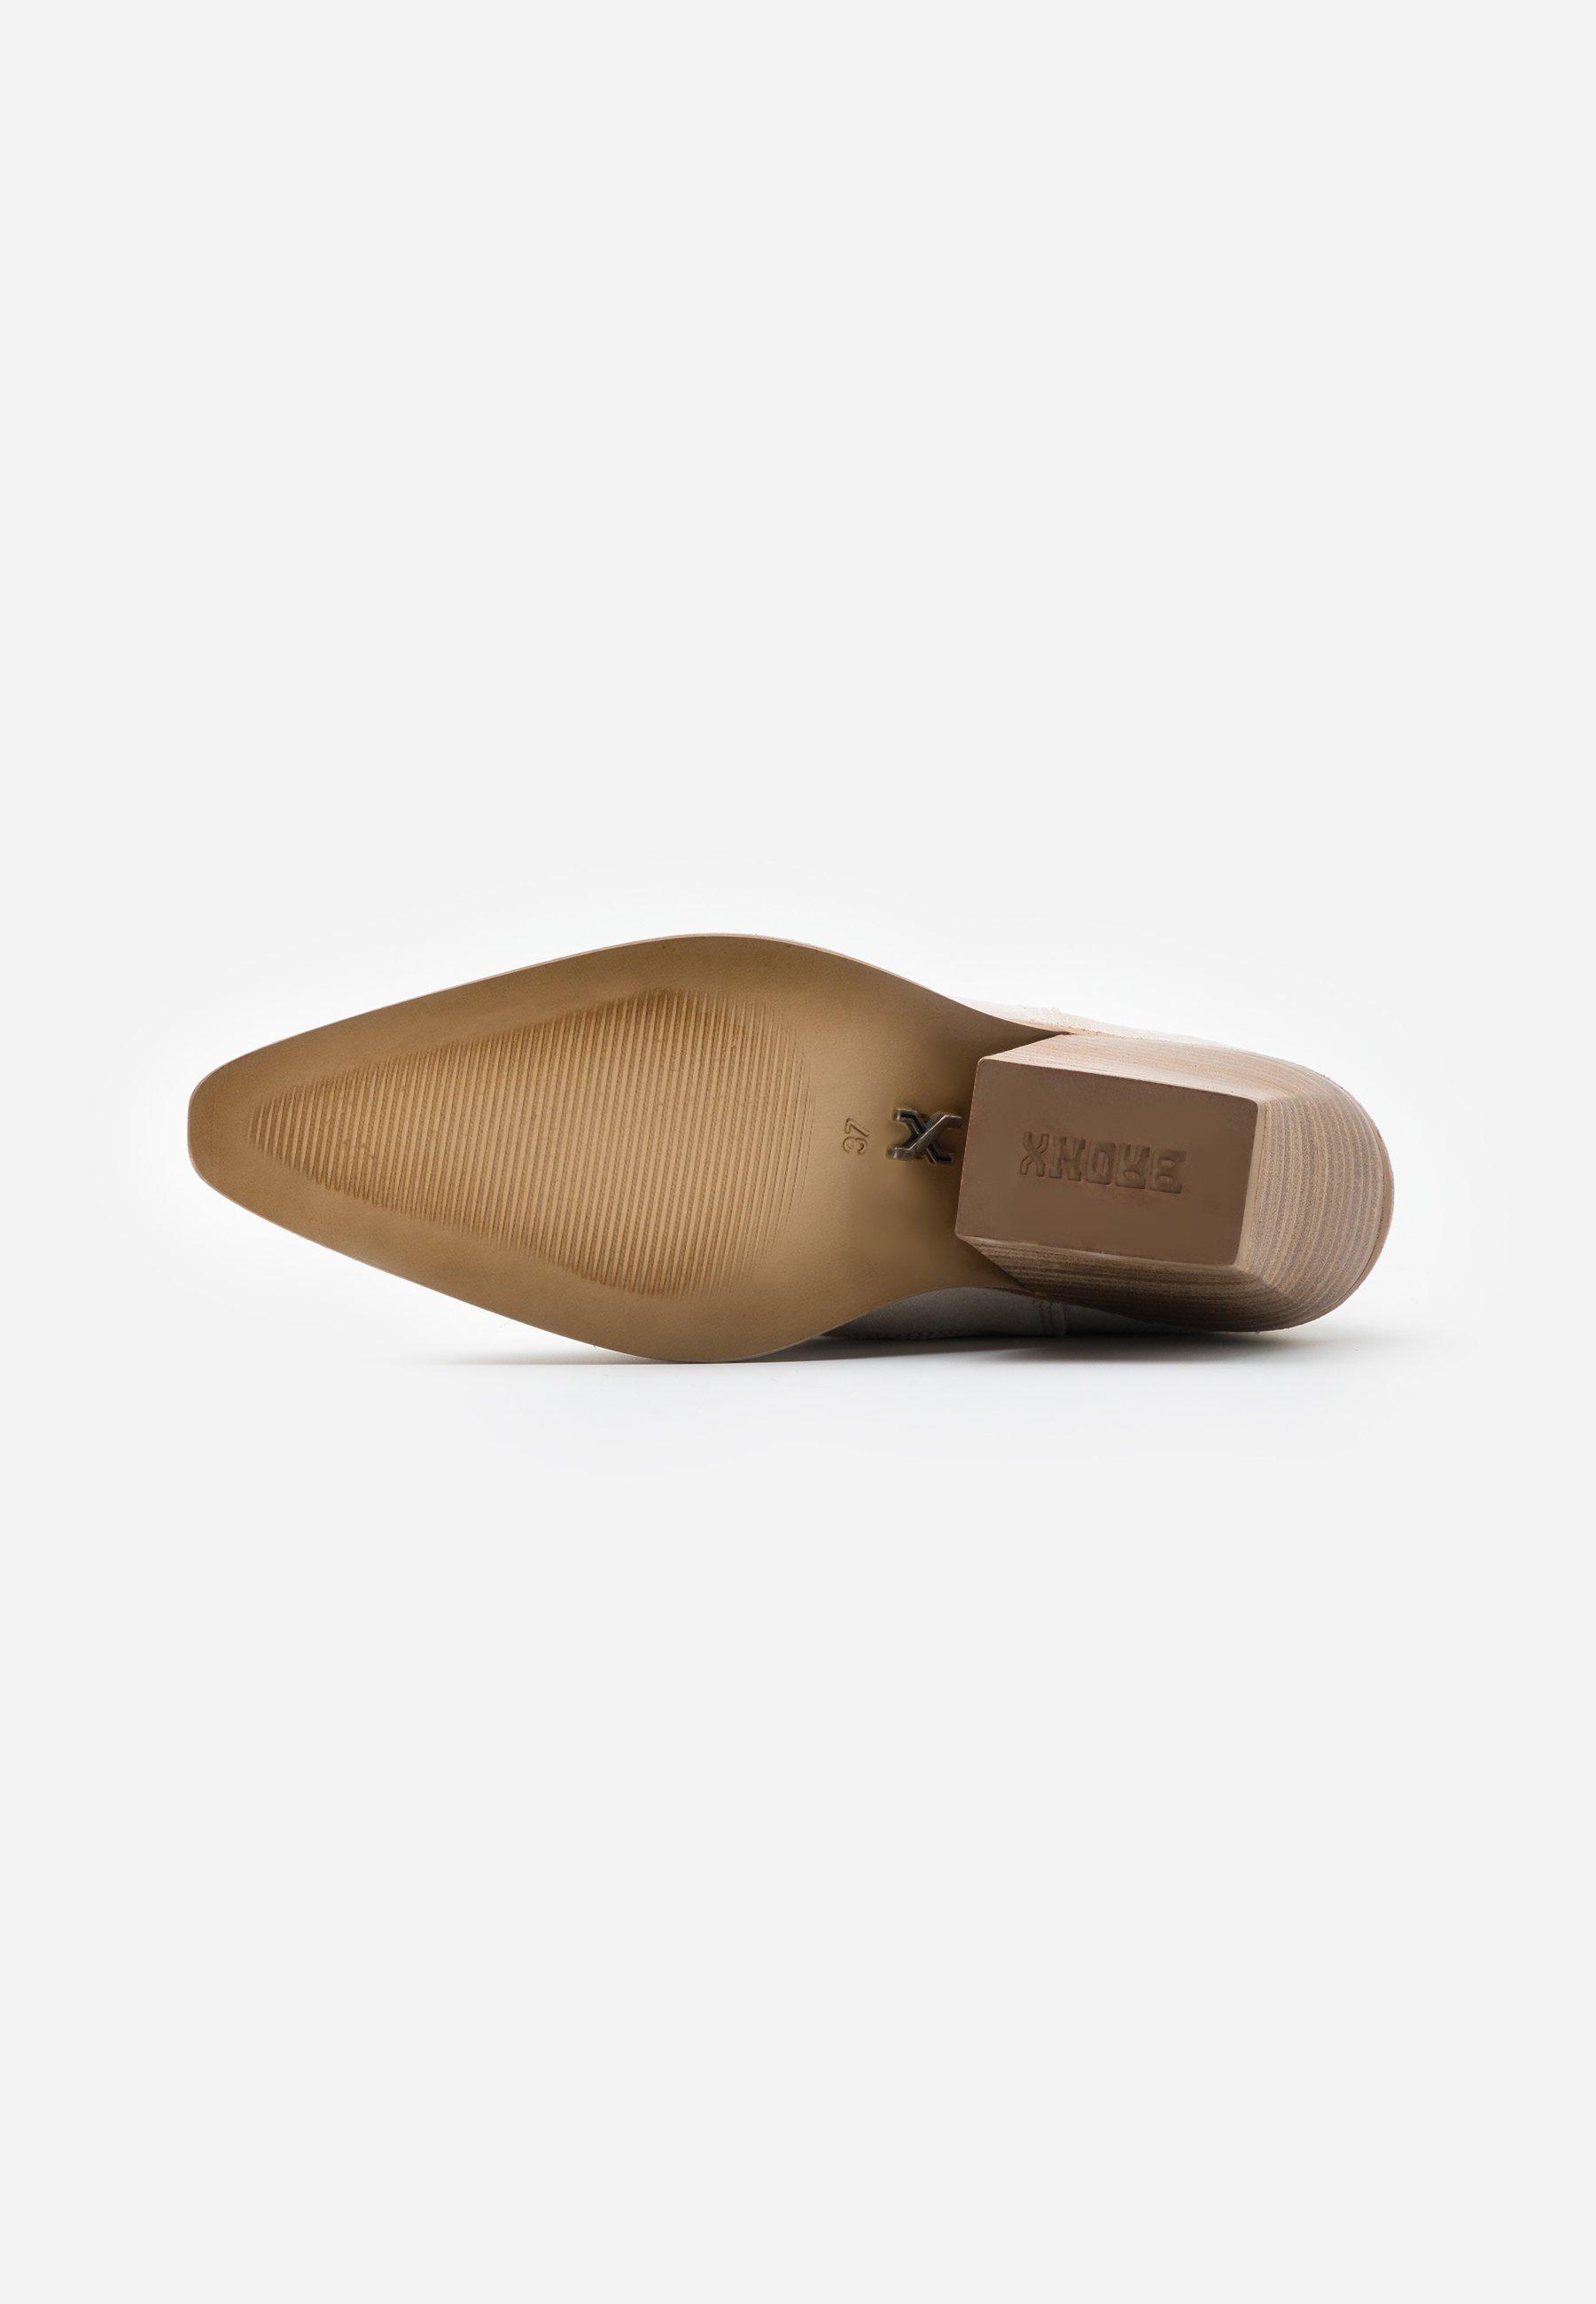 Factory Sale Fashionable Women's Shoes Bronx KOLE Cowboy/Biker boots sand fdBAwF5qQ fMbBL5coT